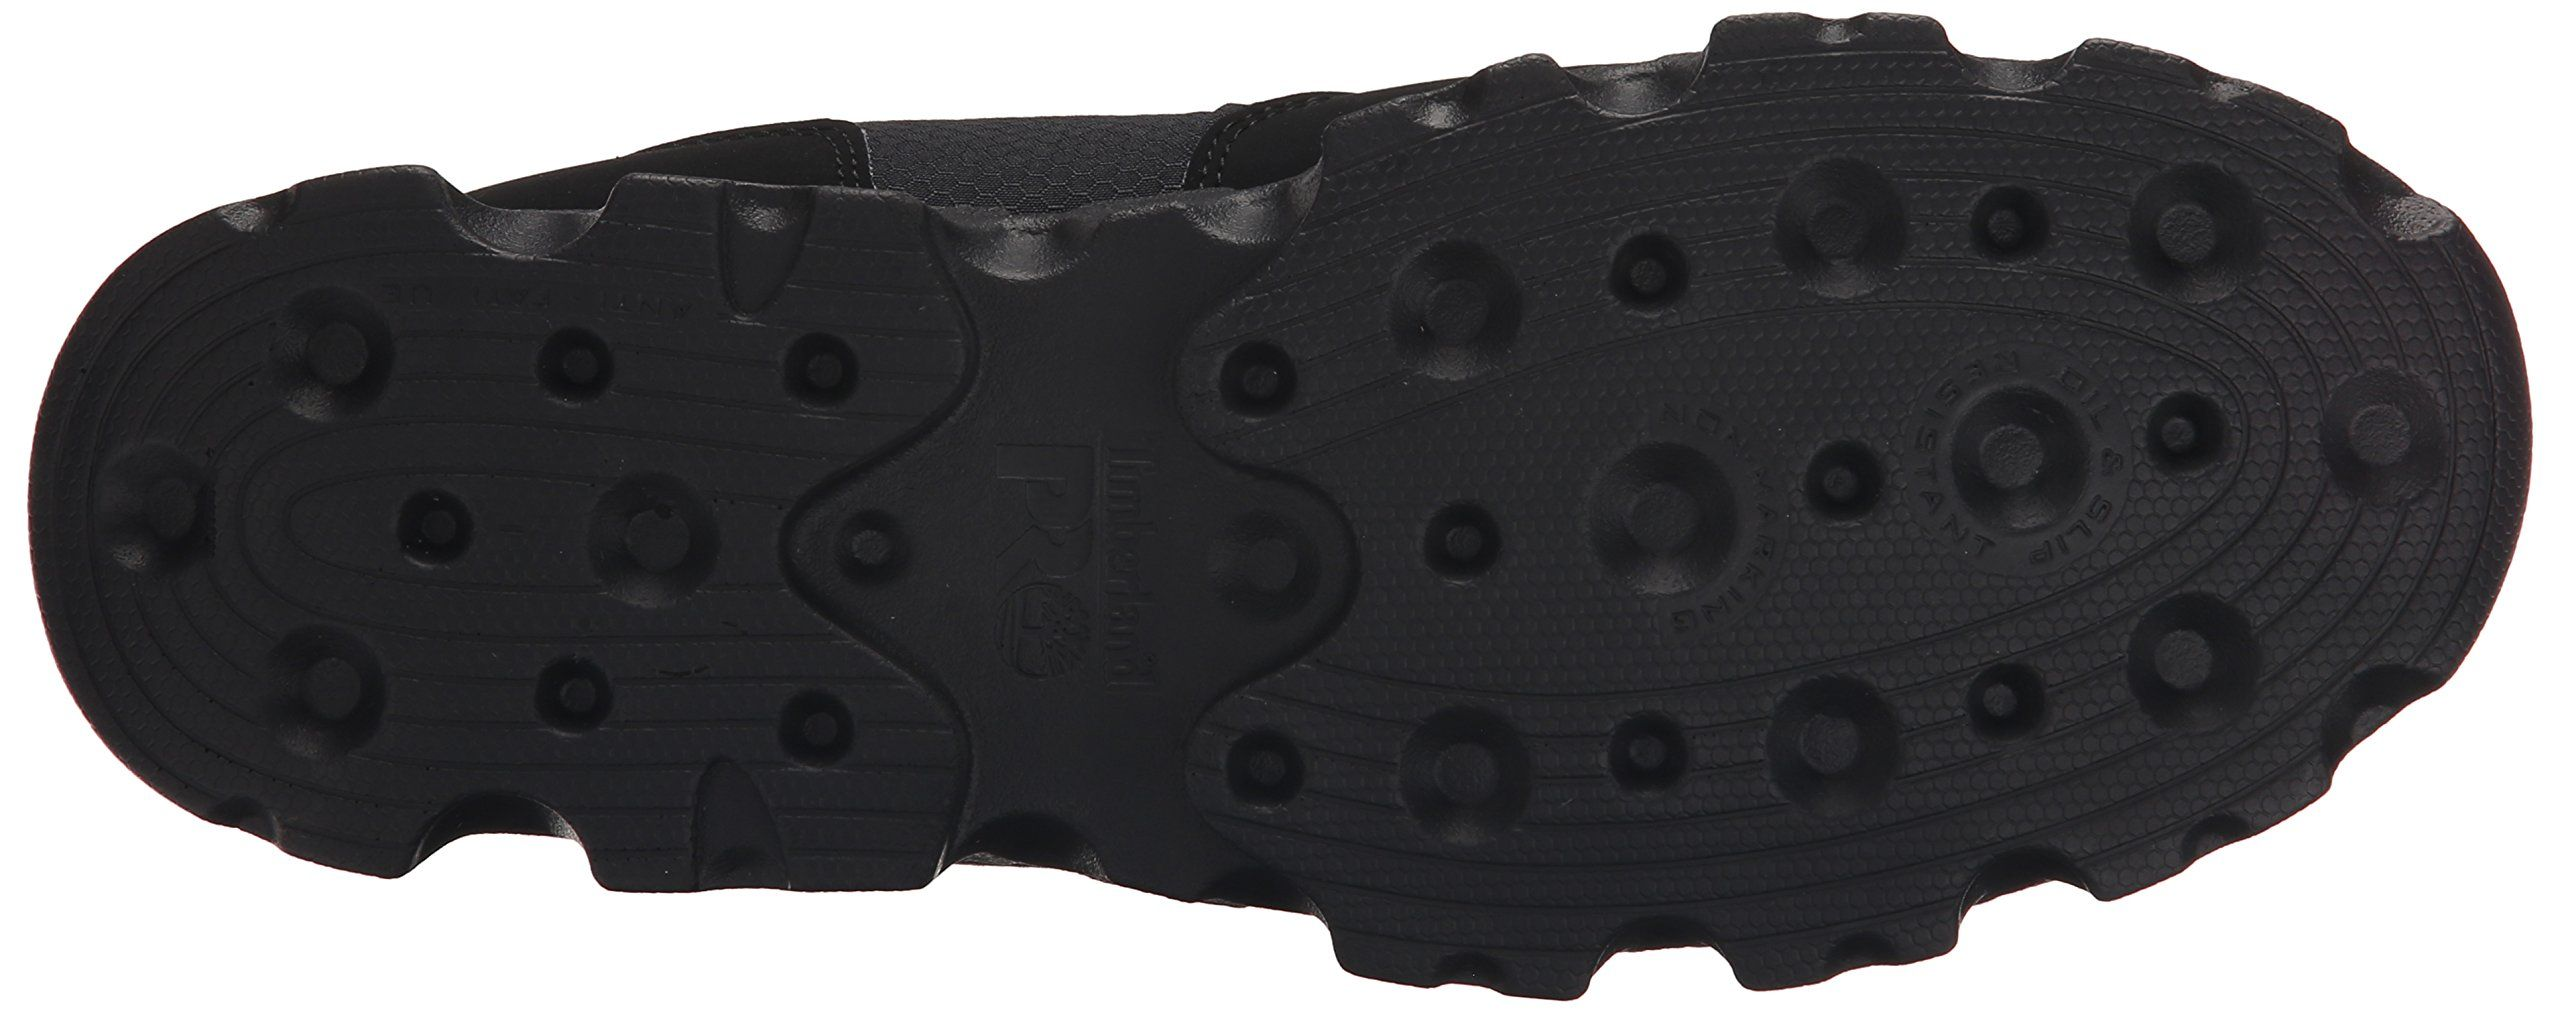 Timberland PRO Men's Powertrain Alloy Toe ESD Low Work Shoe, Black Synthetic/Ripstop Nylon, 9.5 M US